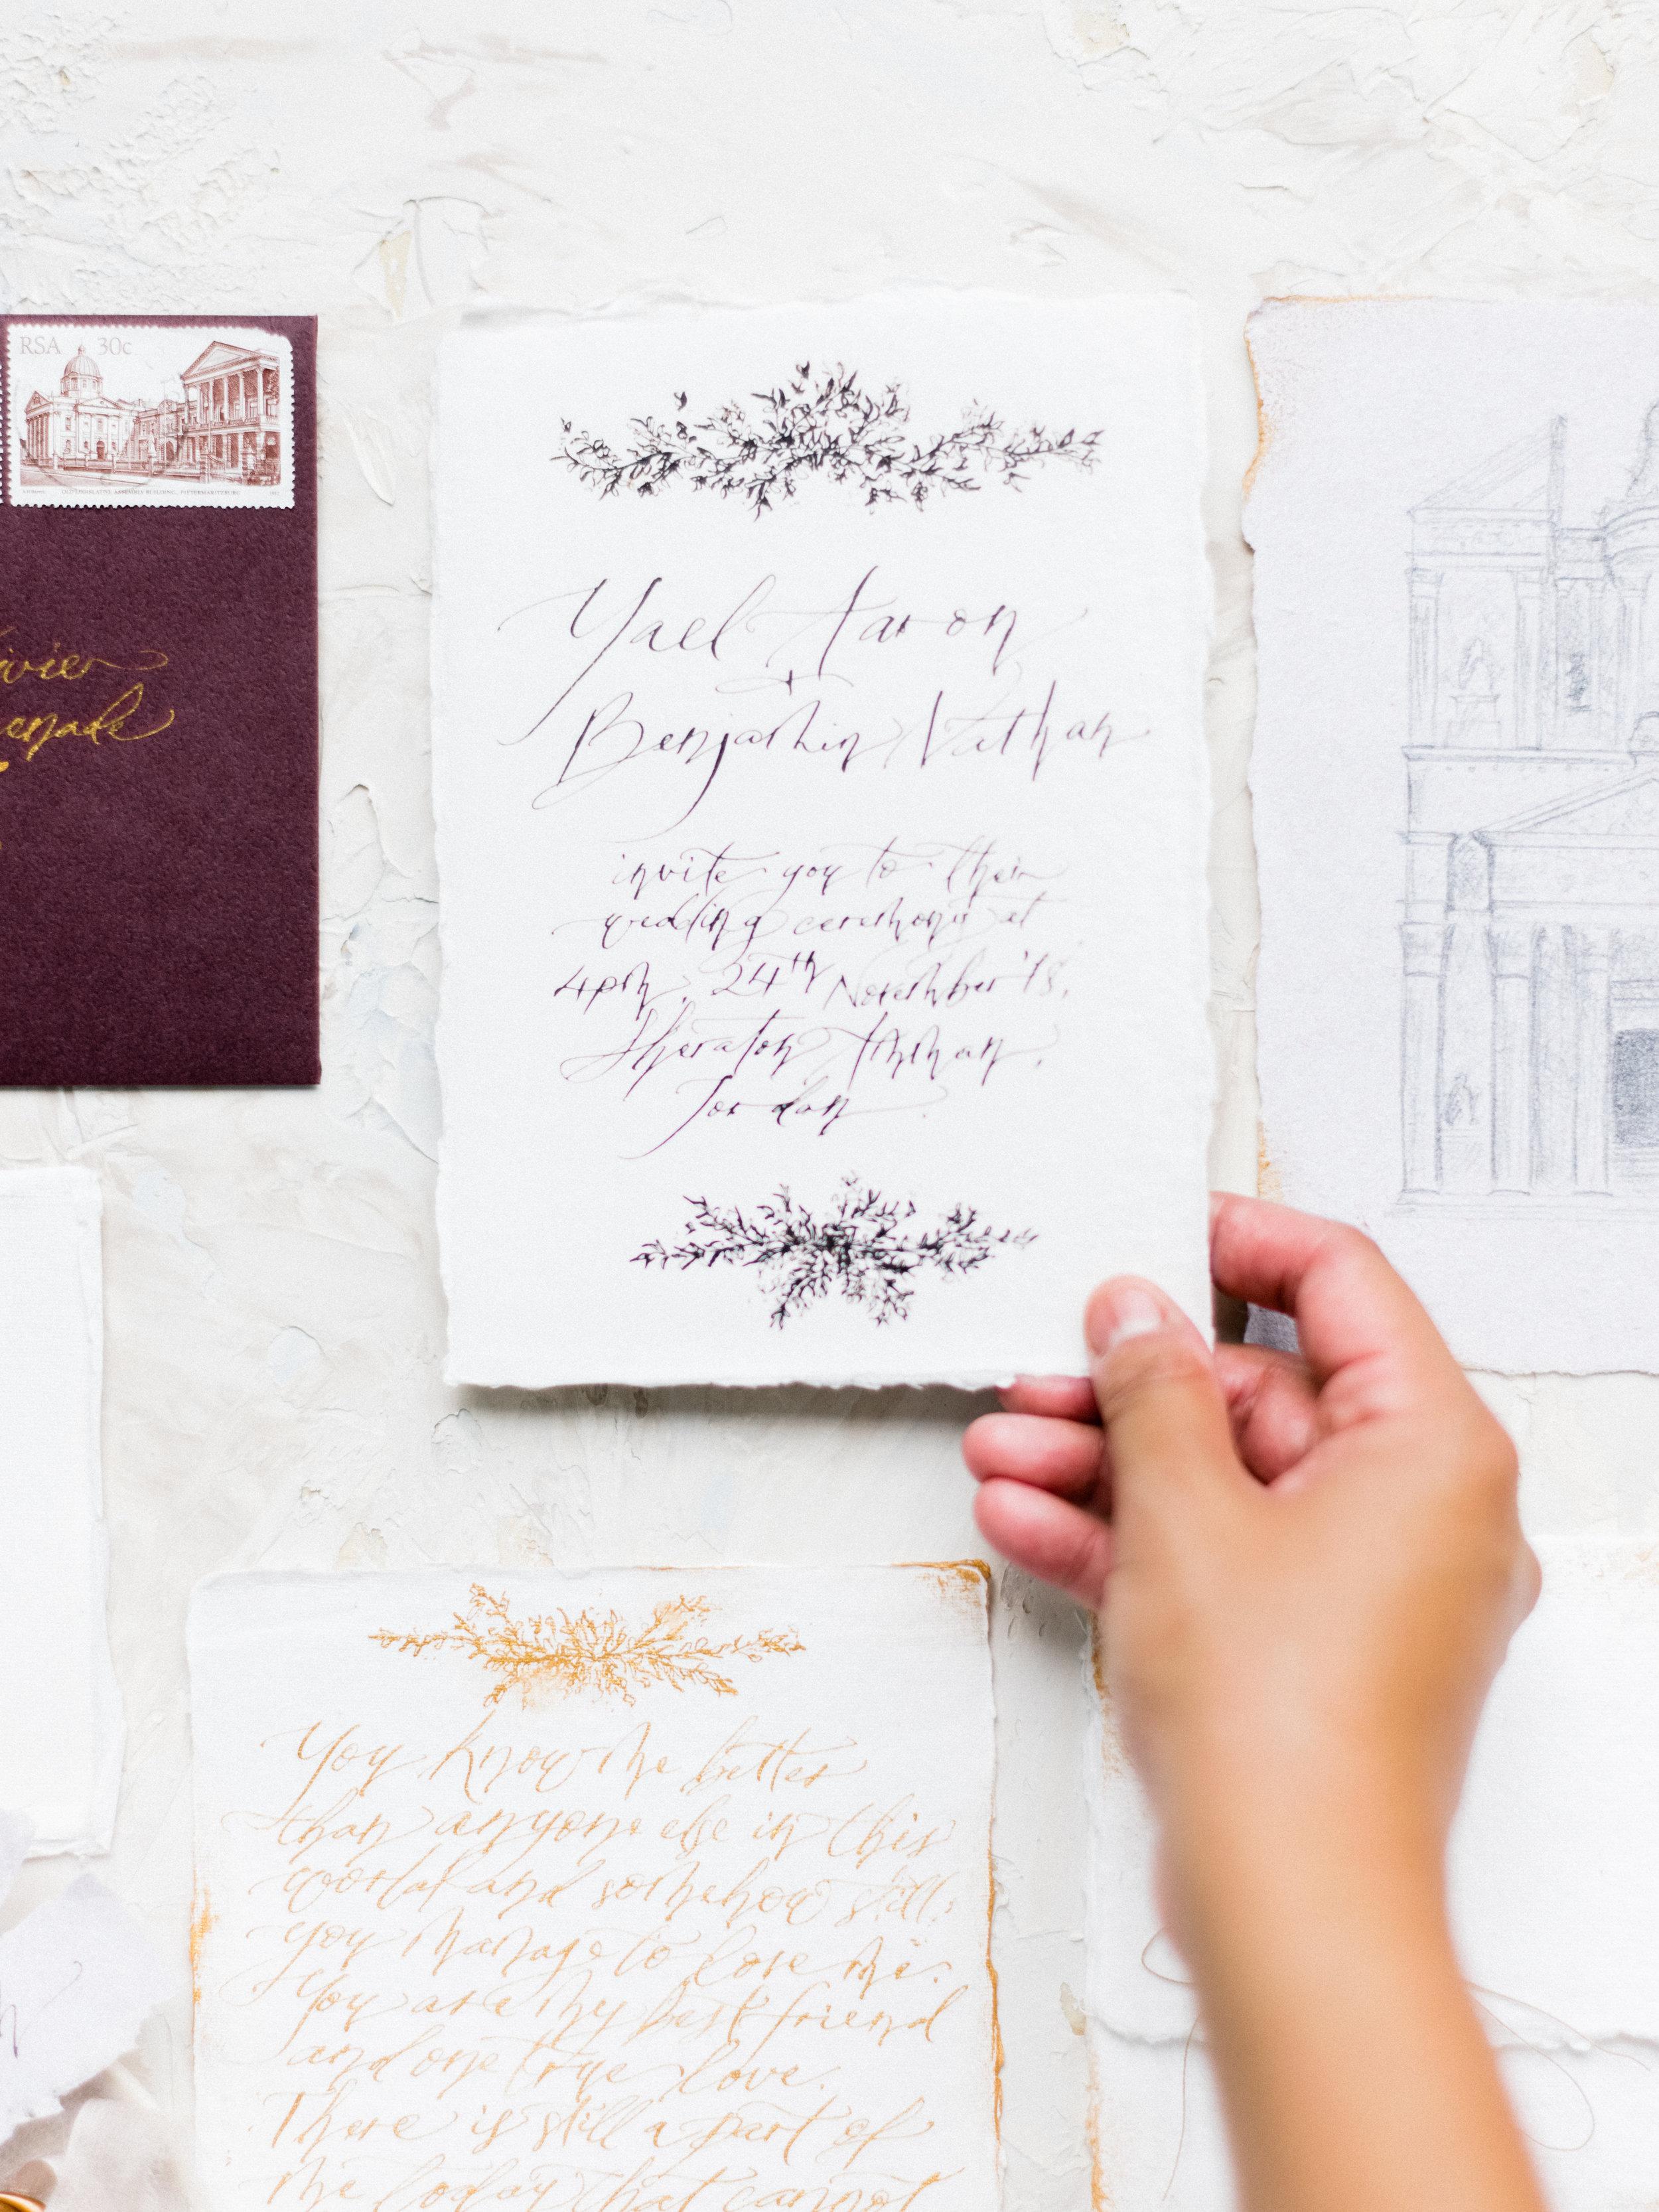 sandra-chau-stylist-fine-art-branding-shoot-calligraphy-invitationsuite-unearthingtc-1.jpg